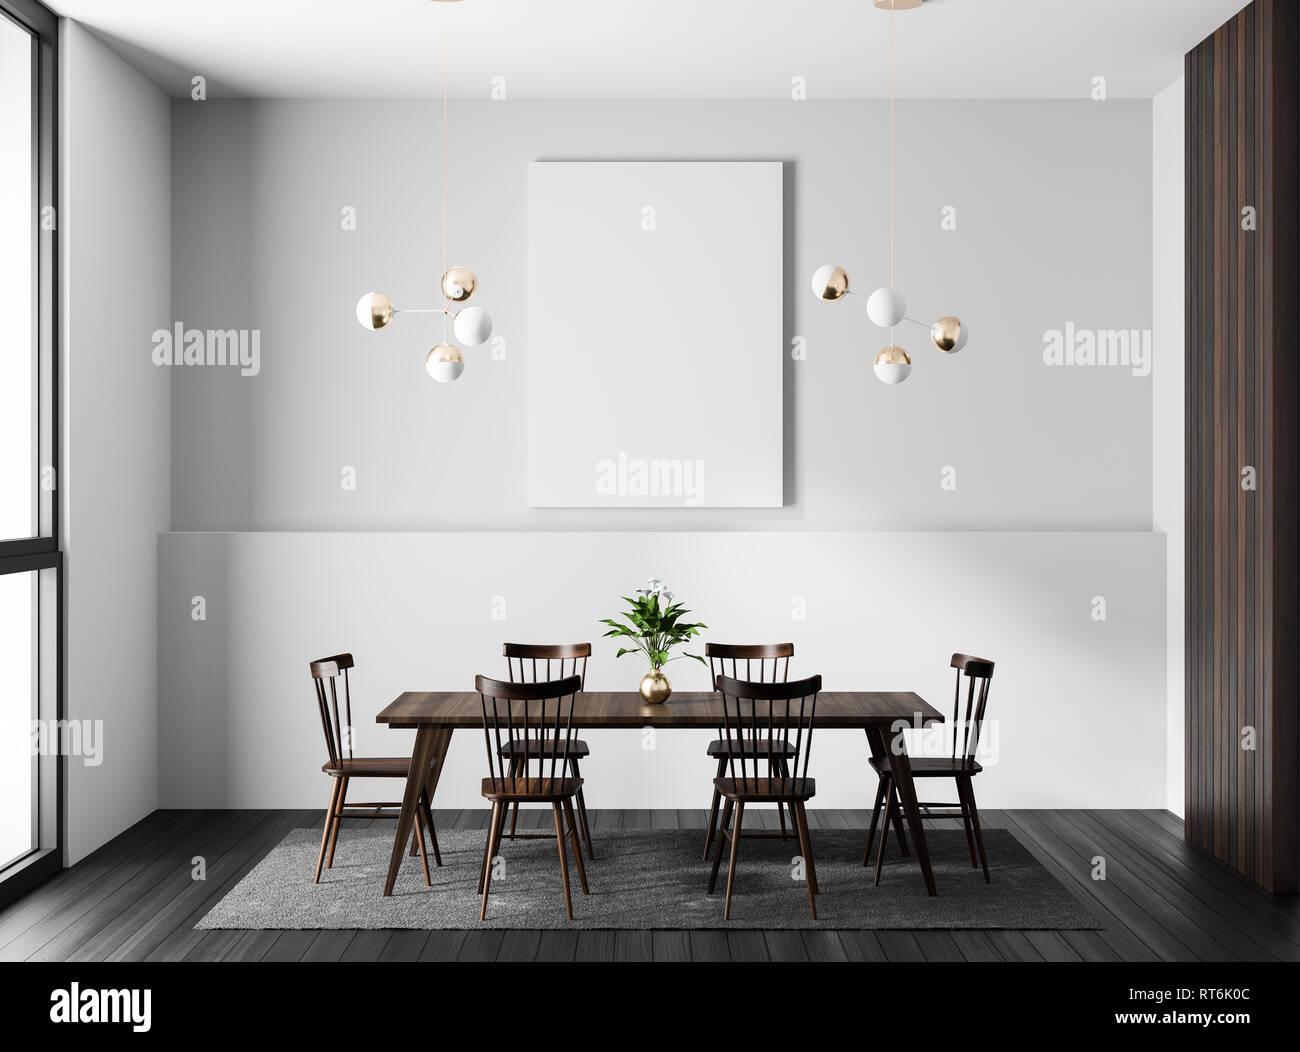 Mock Up Poster Frame In Modern Dining Room Scandinavian Style 3D Illustration